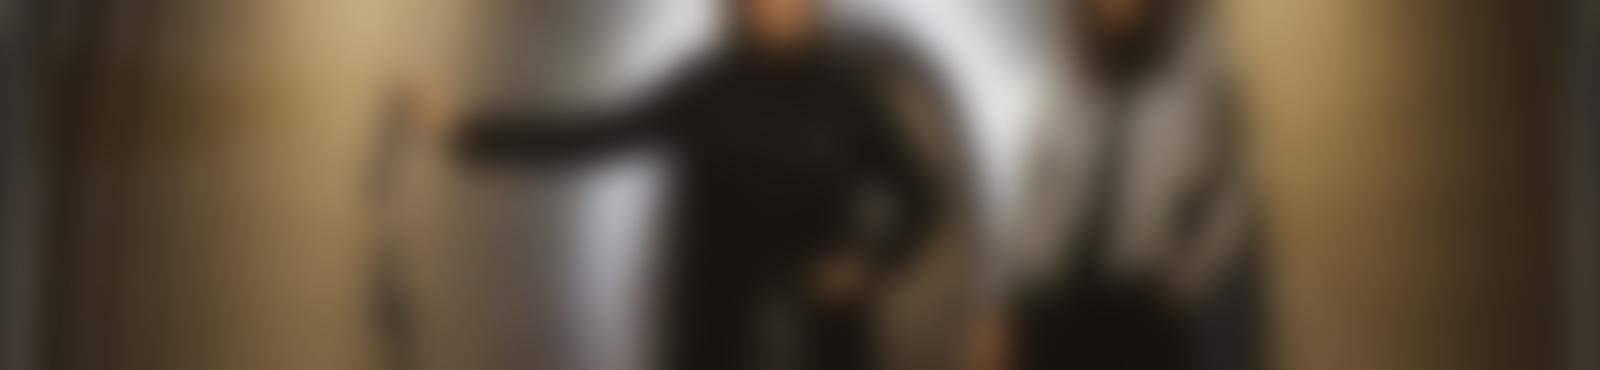 Blurred a78acbf3 ebd0 448c b2d0 2b23c3520996